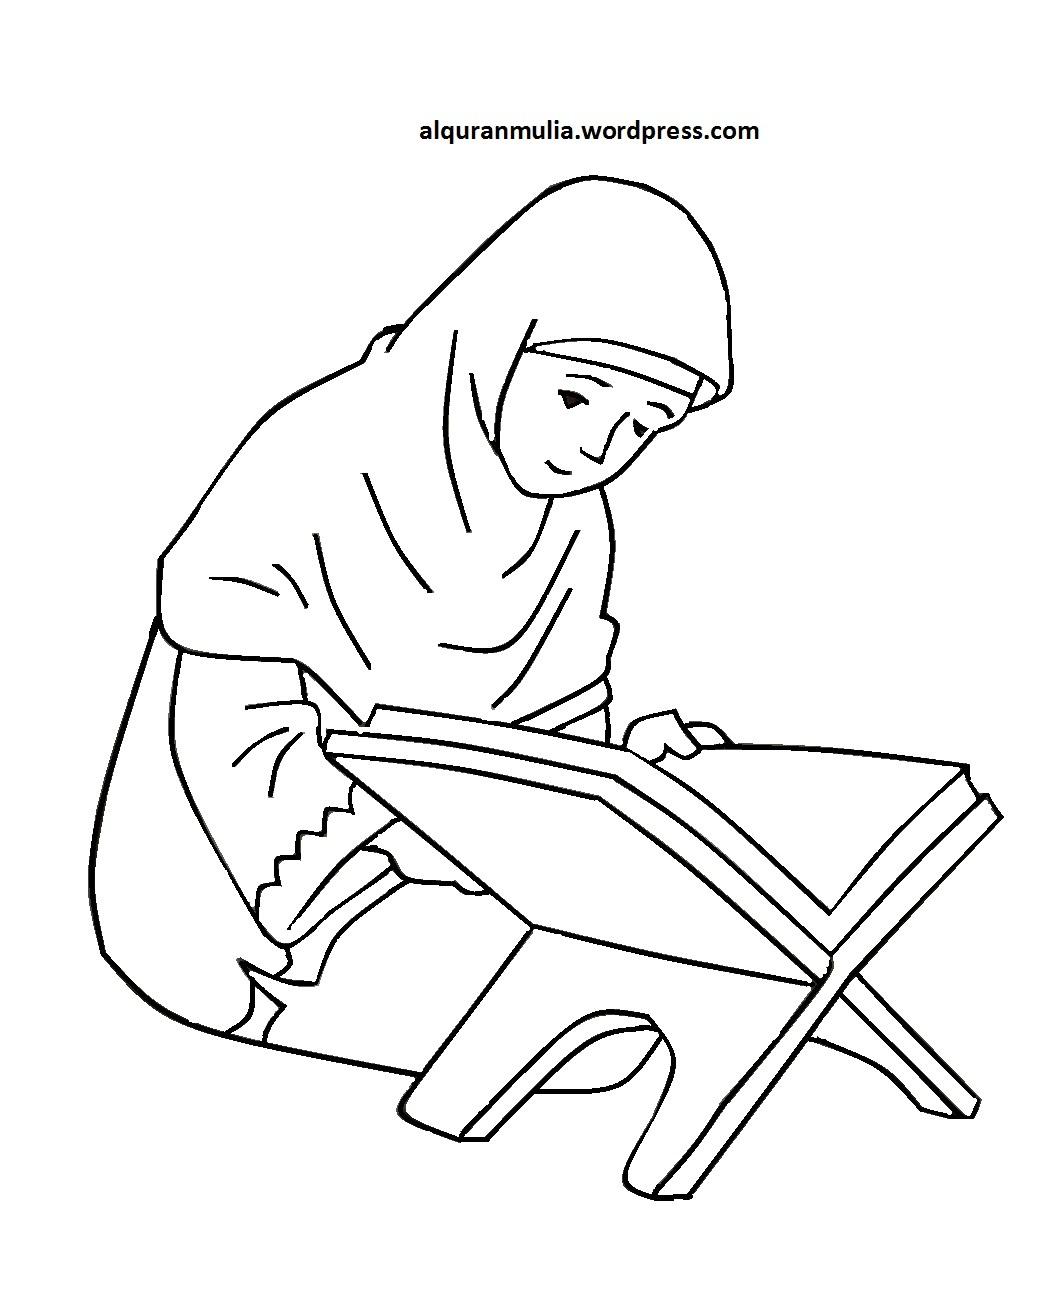 Mewarnai Gambar Kartun Anak Muslimah 85